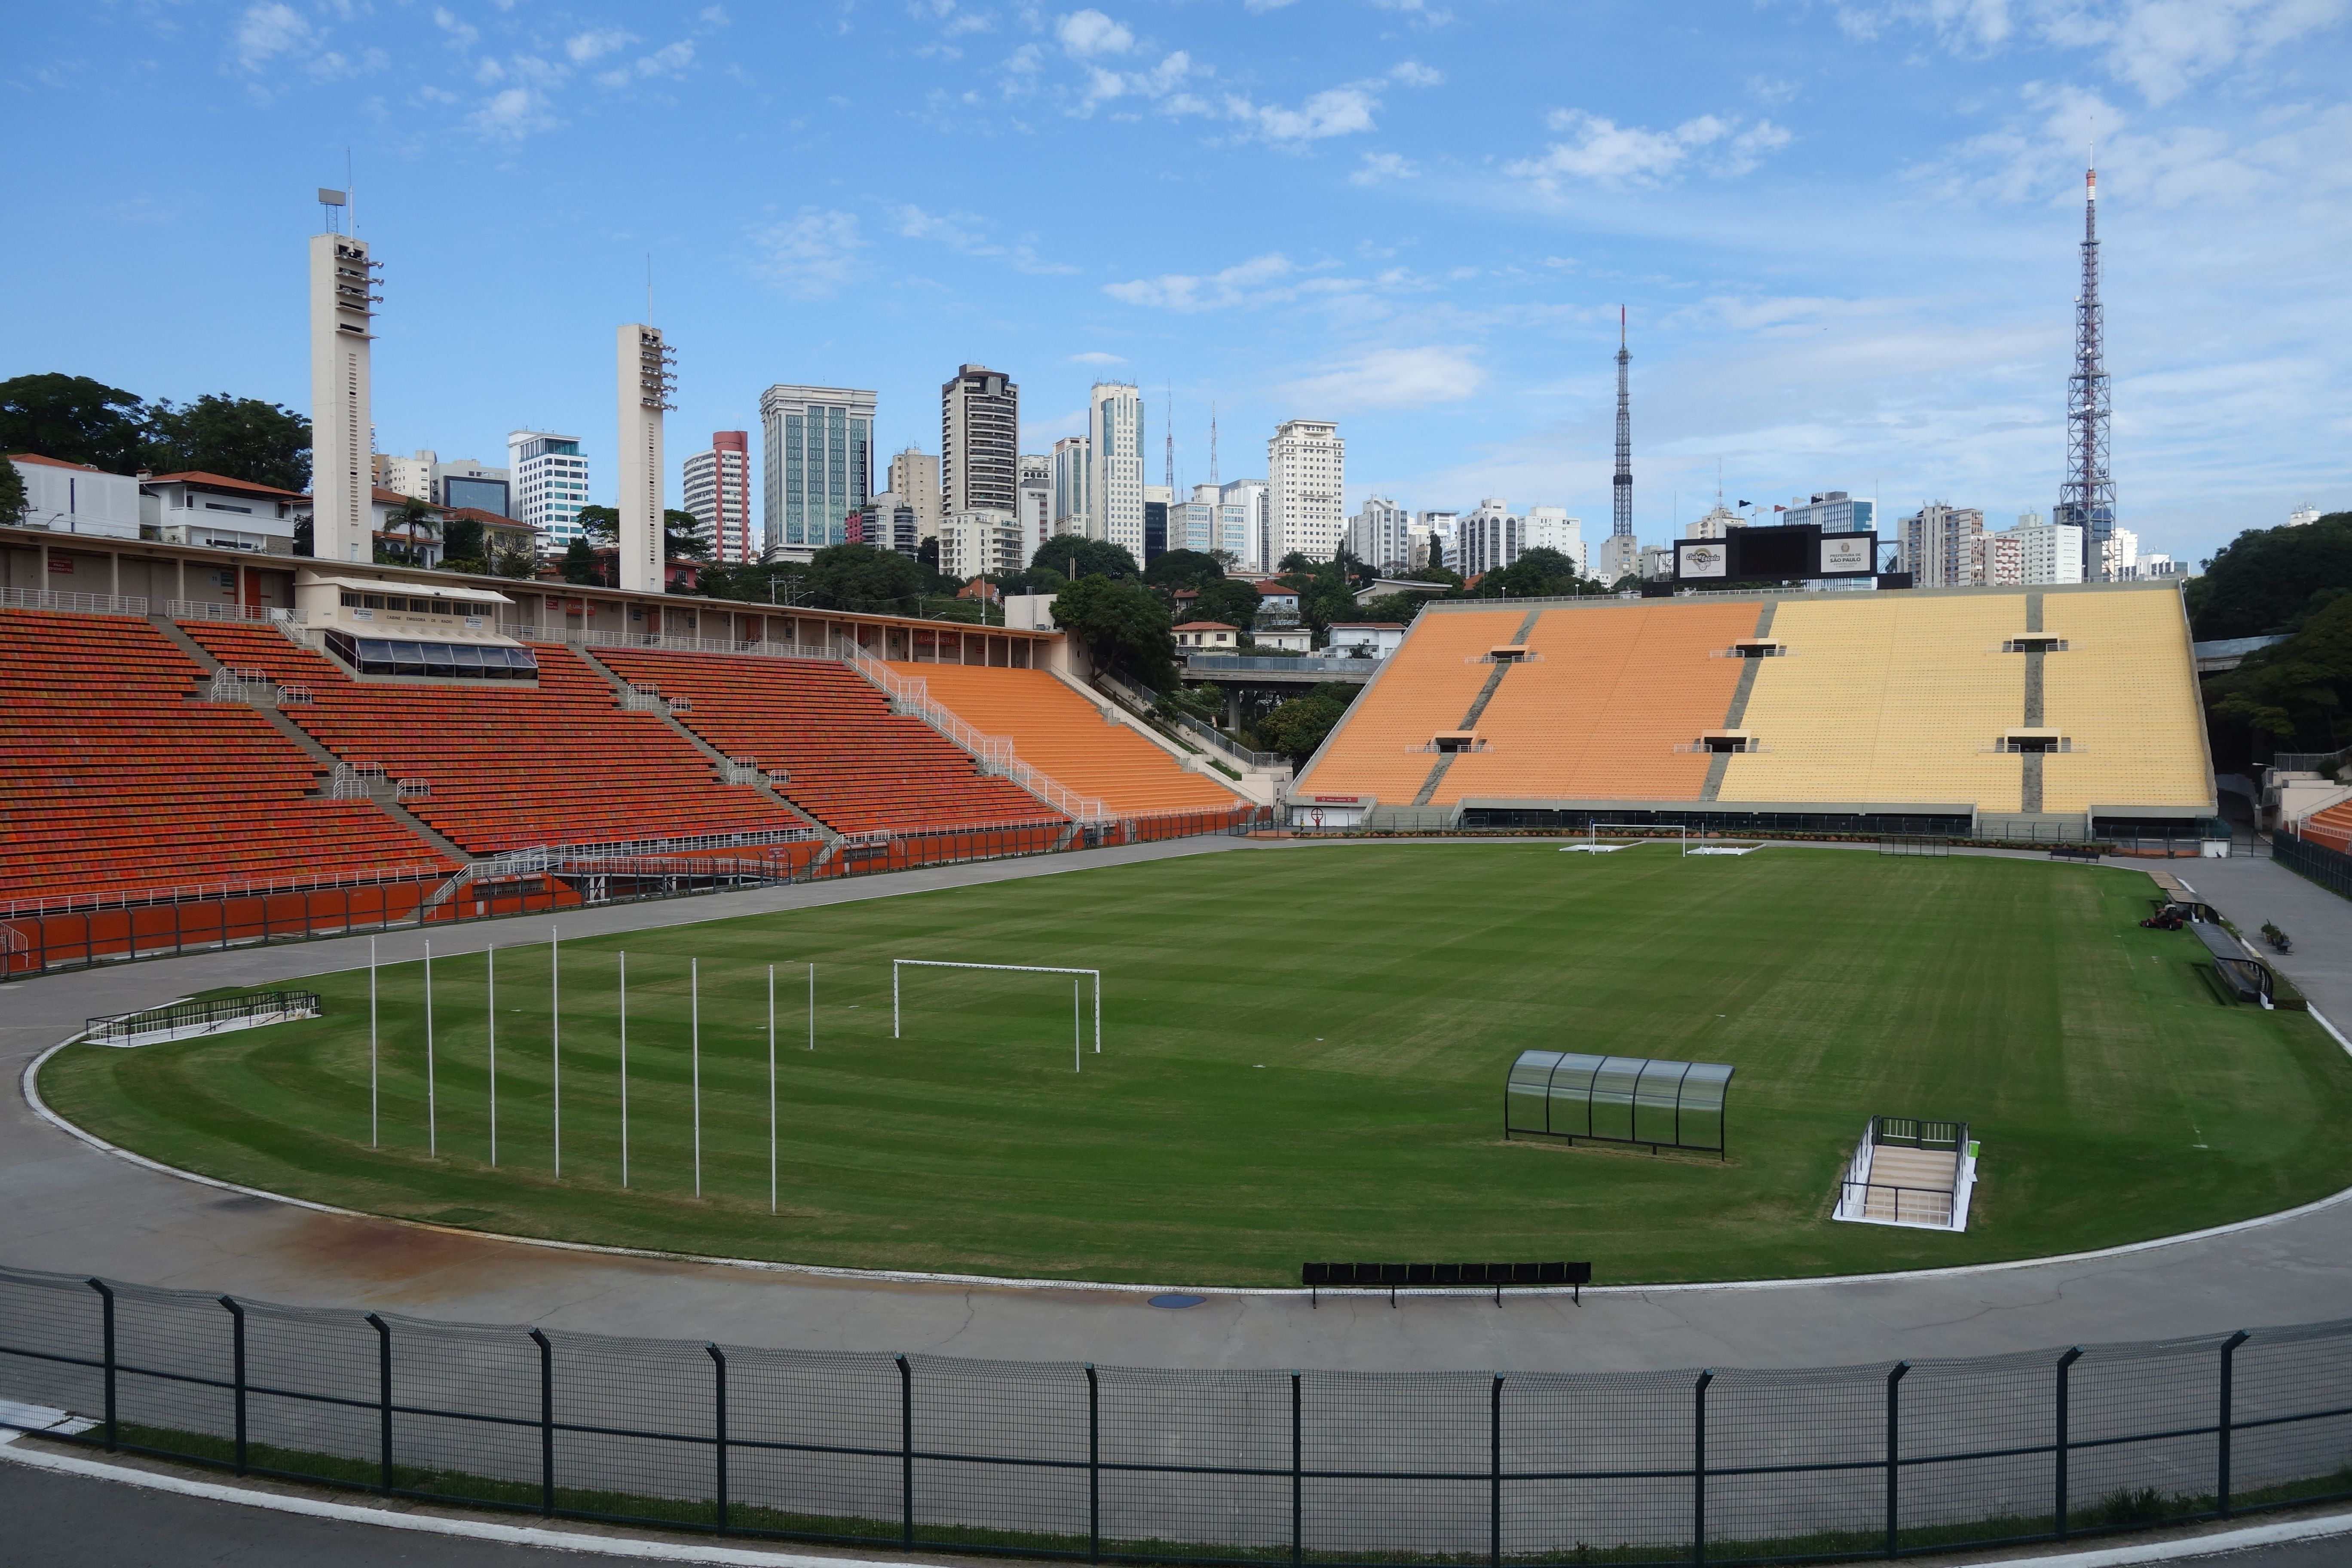 COUPE DU MONDE DE FOOTBALL: Musee du football a Sao Paulo. Le musee se trouve sous les gradins d´un grand stade de Sao Paulo.